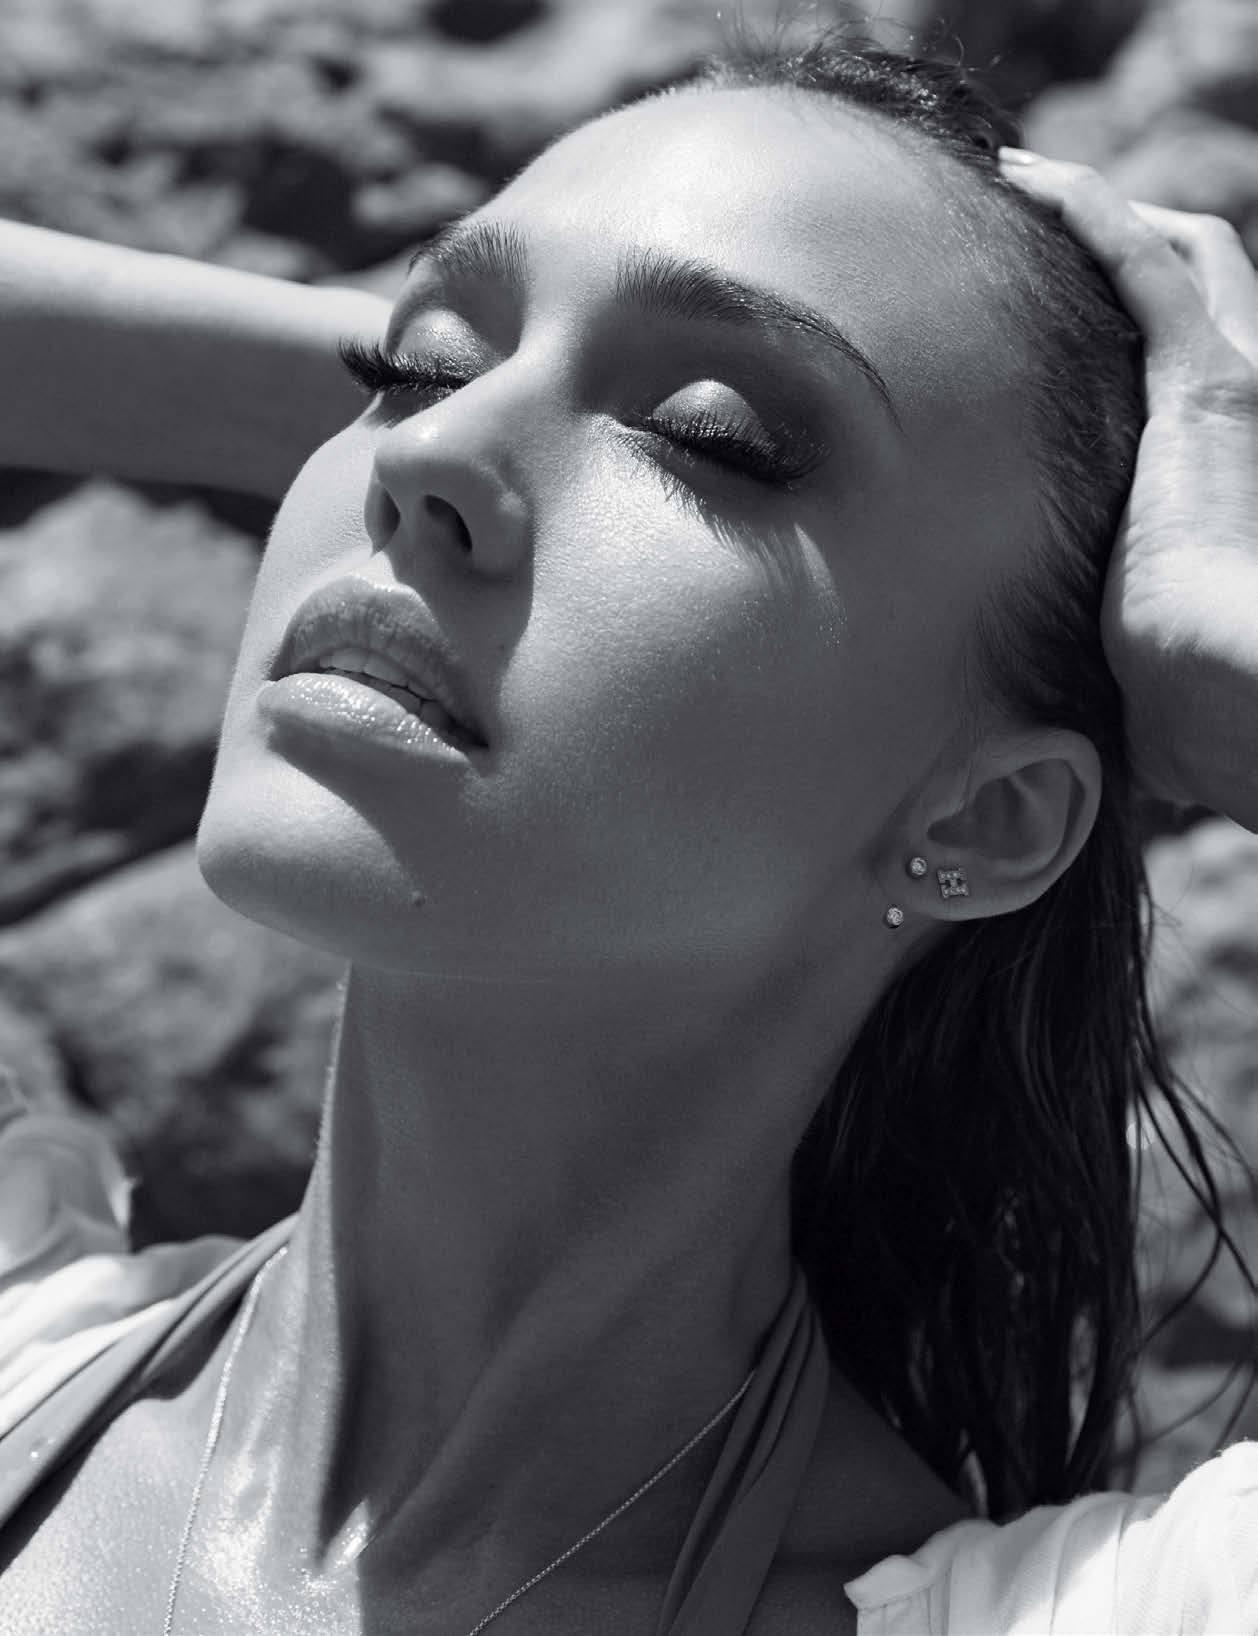 Jessica Alba – Beautiful Body In Sexy Photoshoot For Maxim Magazine (september 2014) (hq) 0012